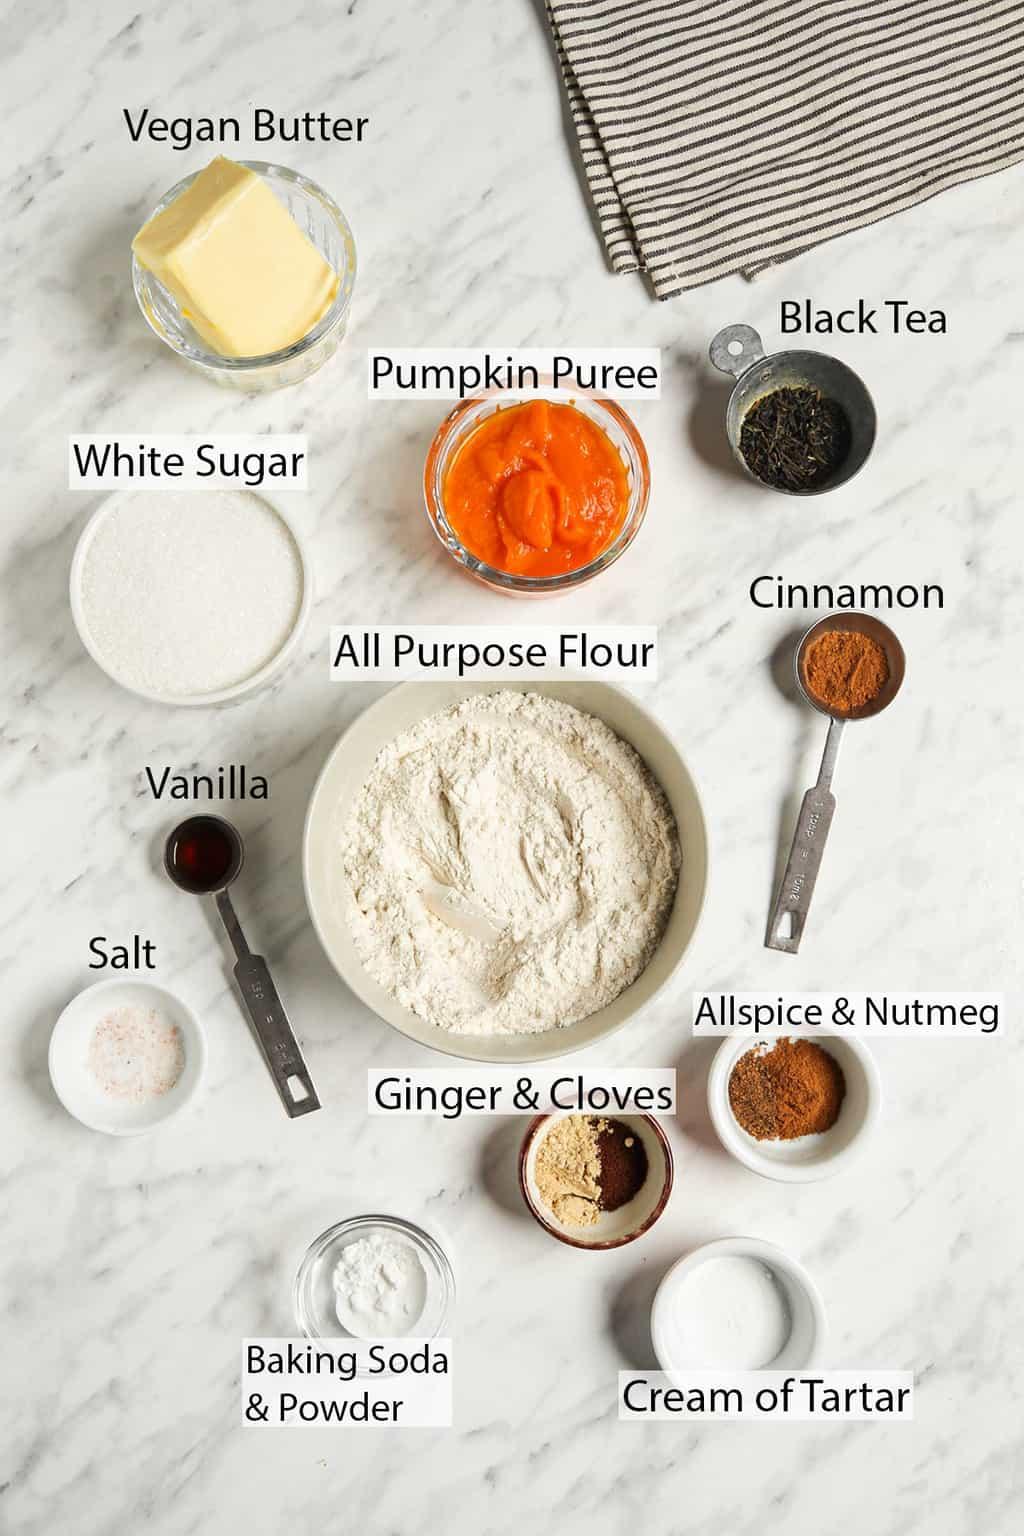 ingredients shot with linen including vegan butter, pumpkin puree, black tea, granulated sugar, all-purpose flour, cinnamon, vanilla, salt, ginger, cloves, allspice, nutmeg, baking soda and powder, and cream of tartar